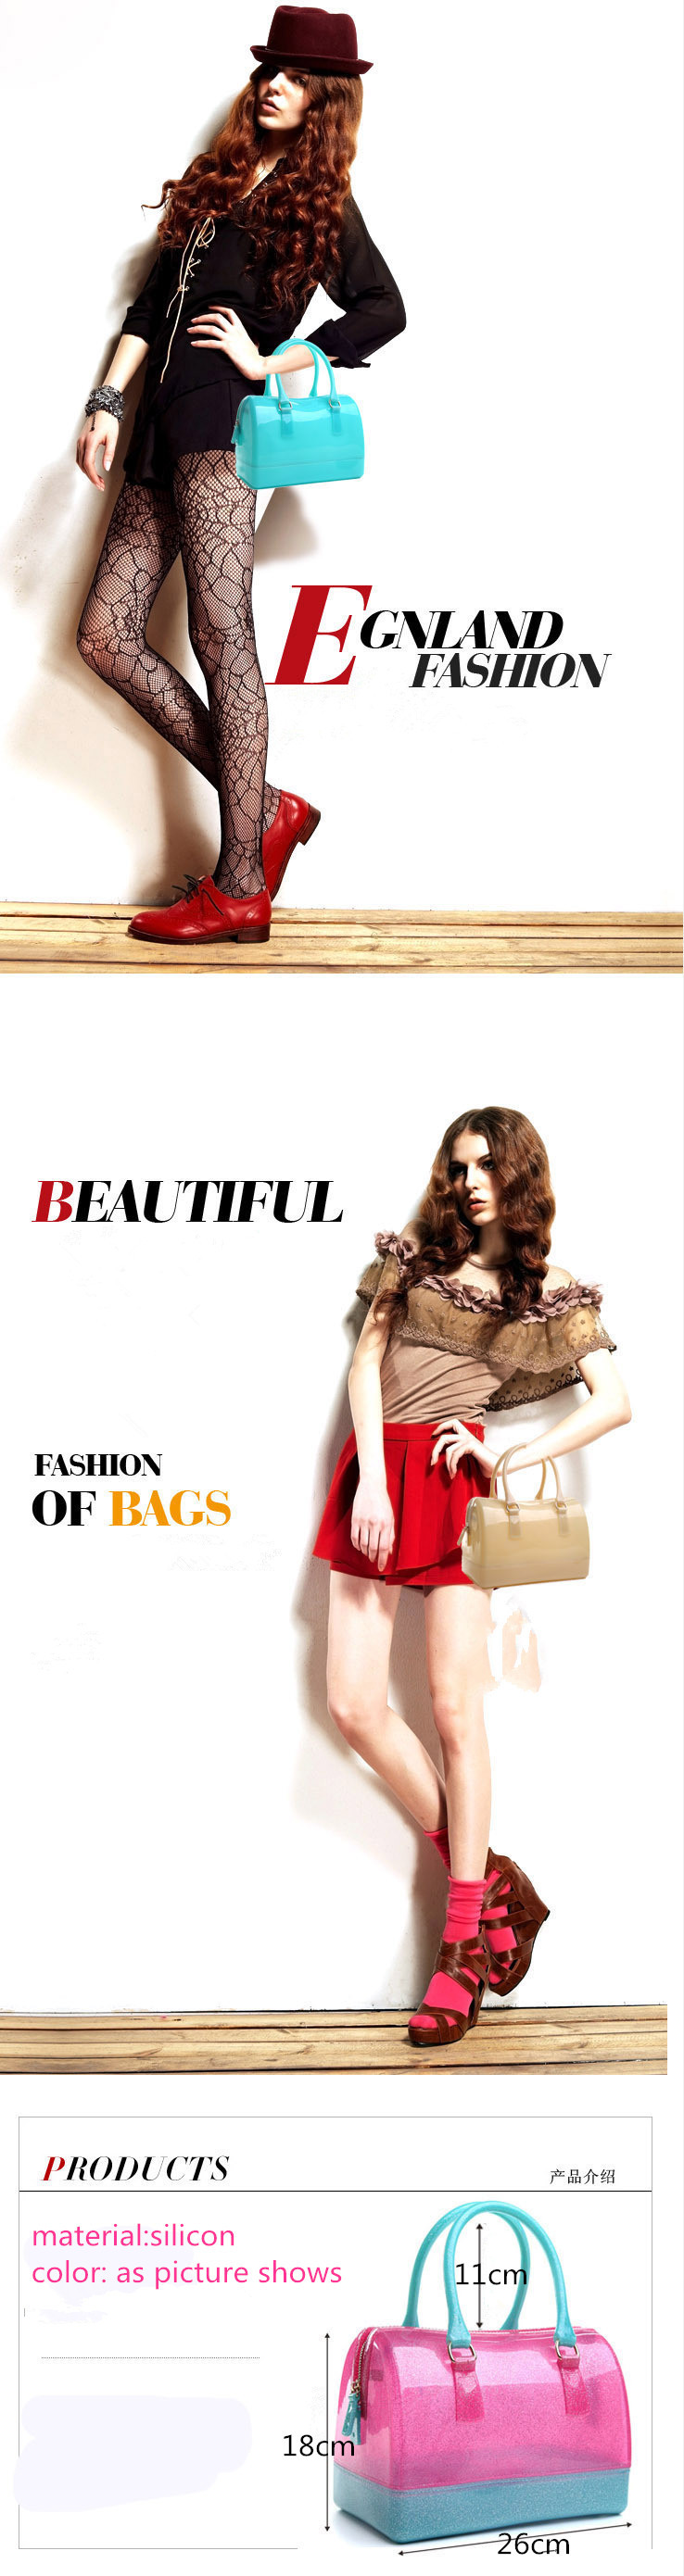 travesseiro superior bolsa colorida bolsa feminina tote saco balestra